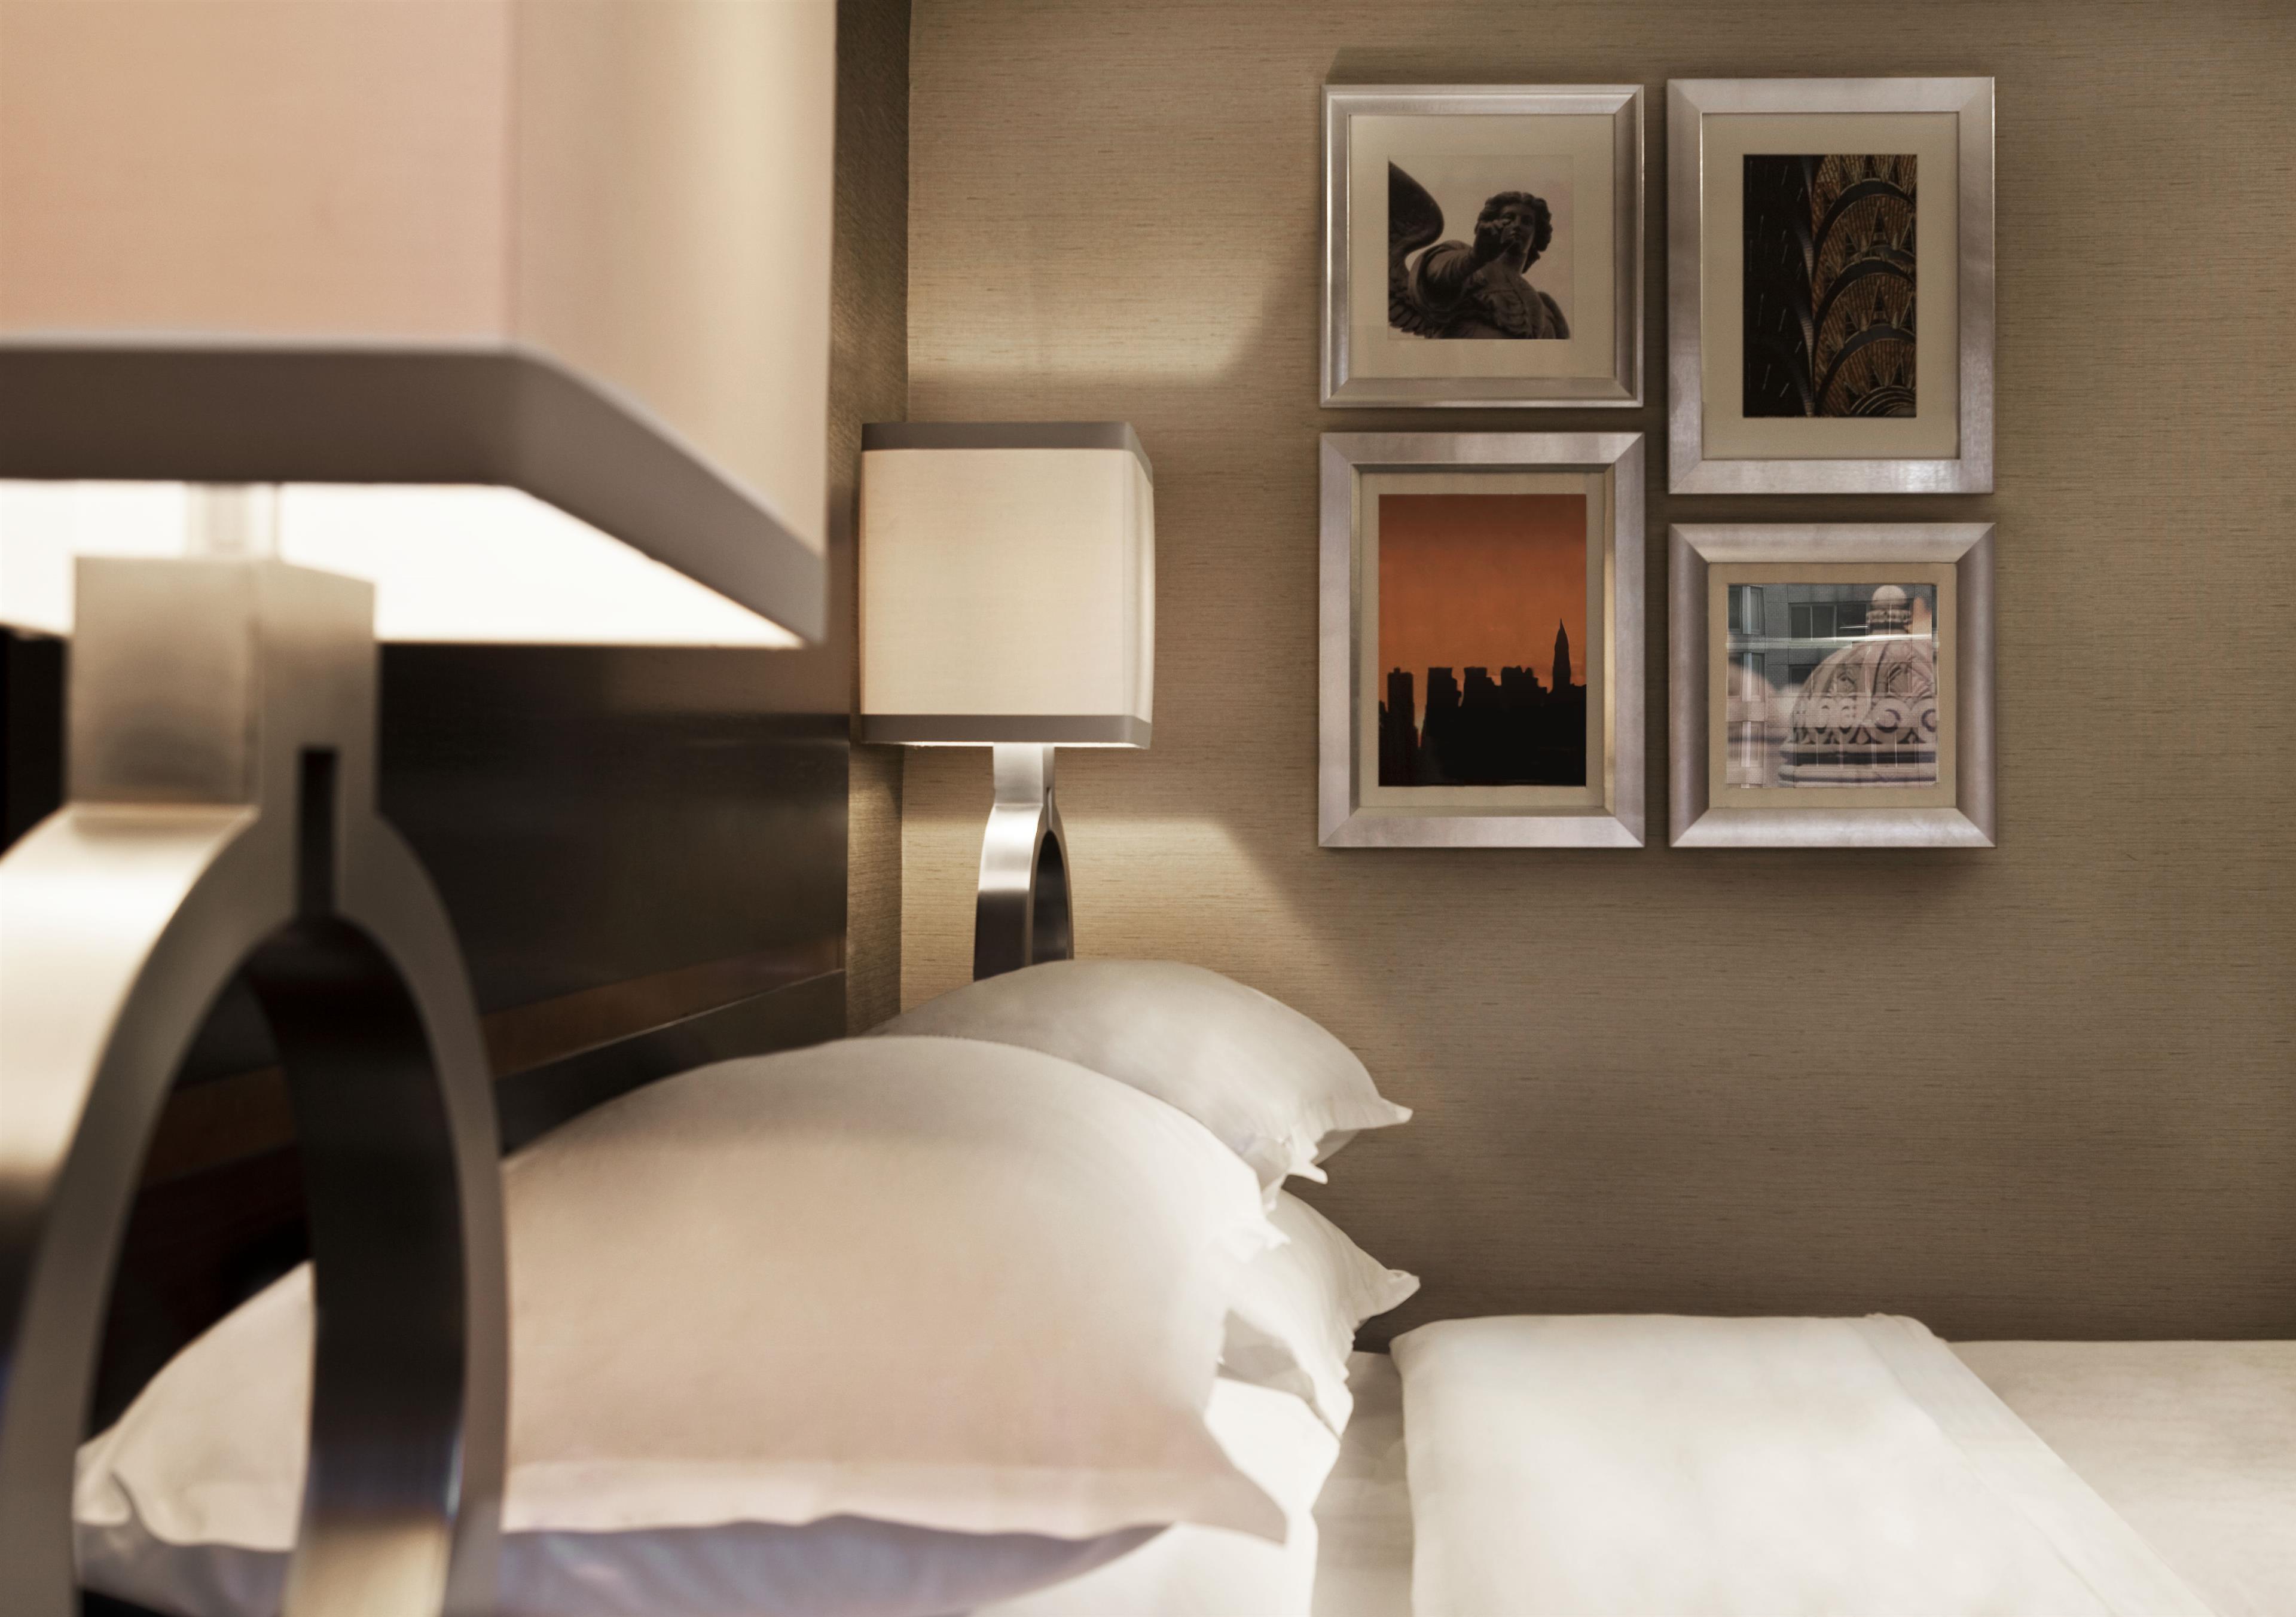 Sheraton New York Times Square Hotel image 8